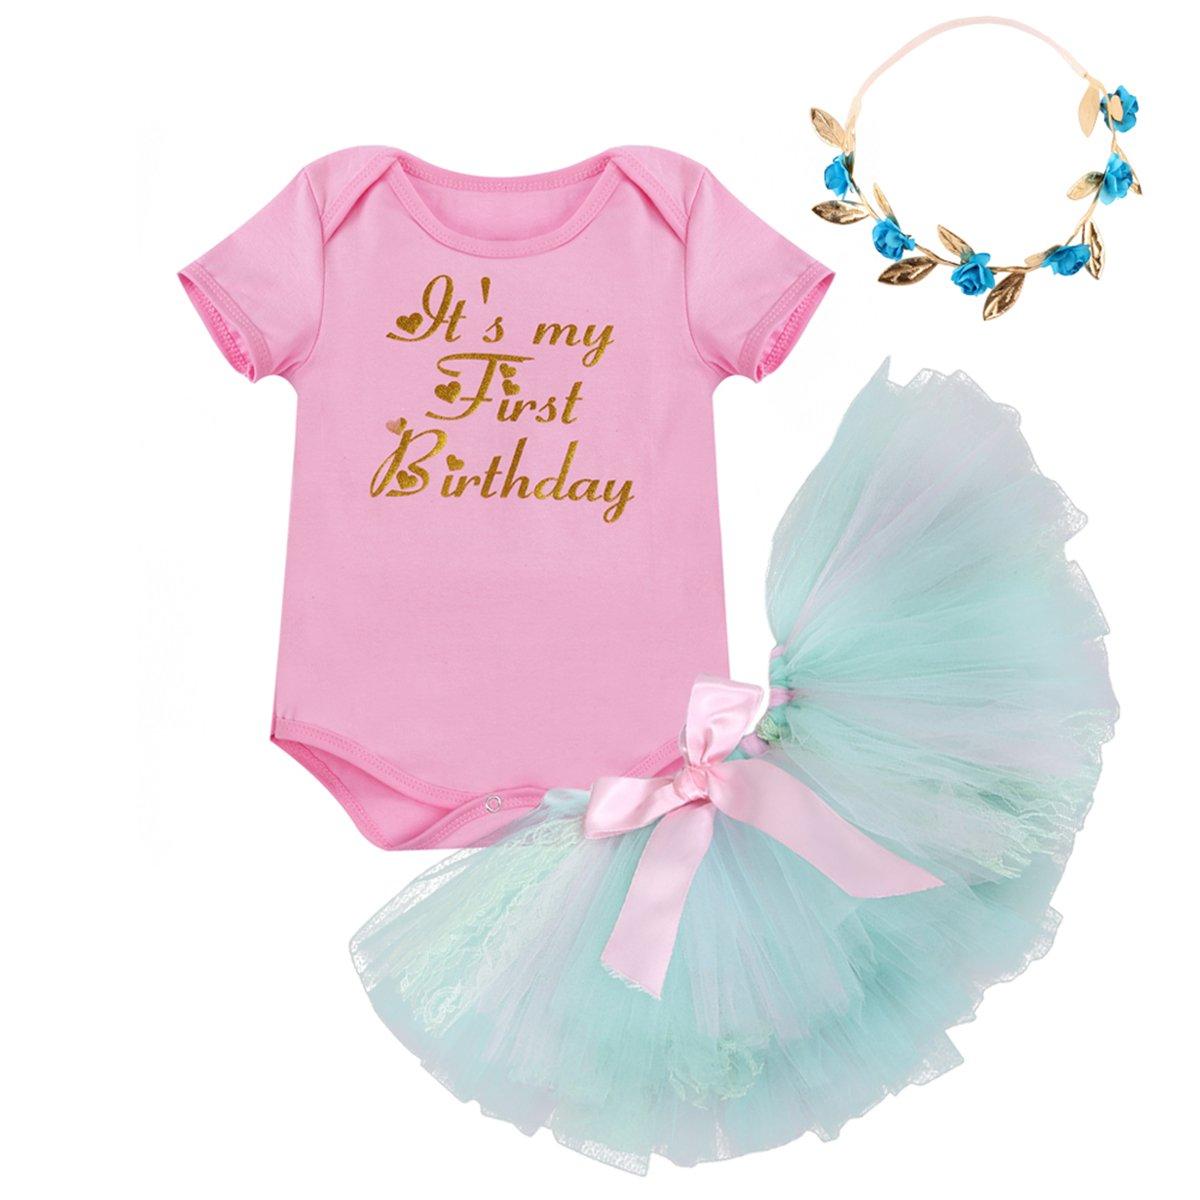 Baby Girls 3PCs Sets My 1st Birthday Cake Smash Outfits Unicorn Crown Tutu Romper Dress Short Bodysuit Headband